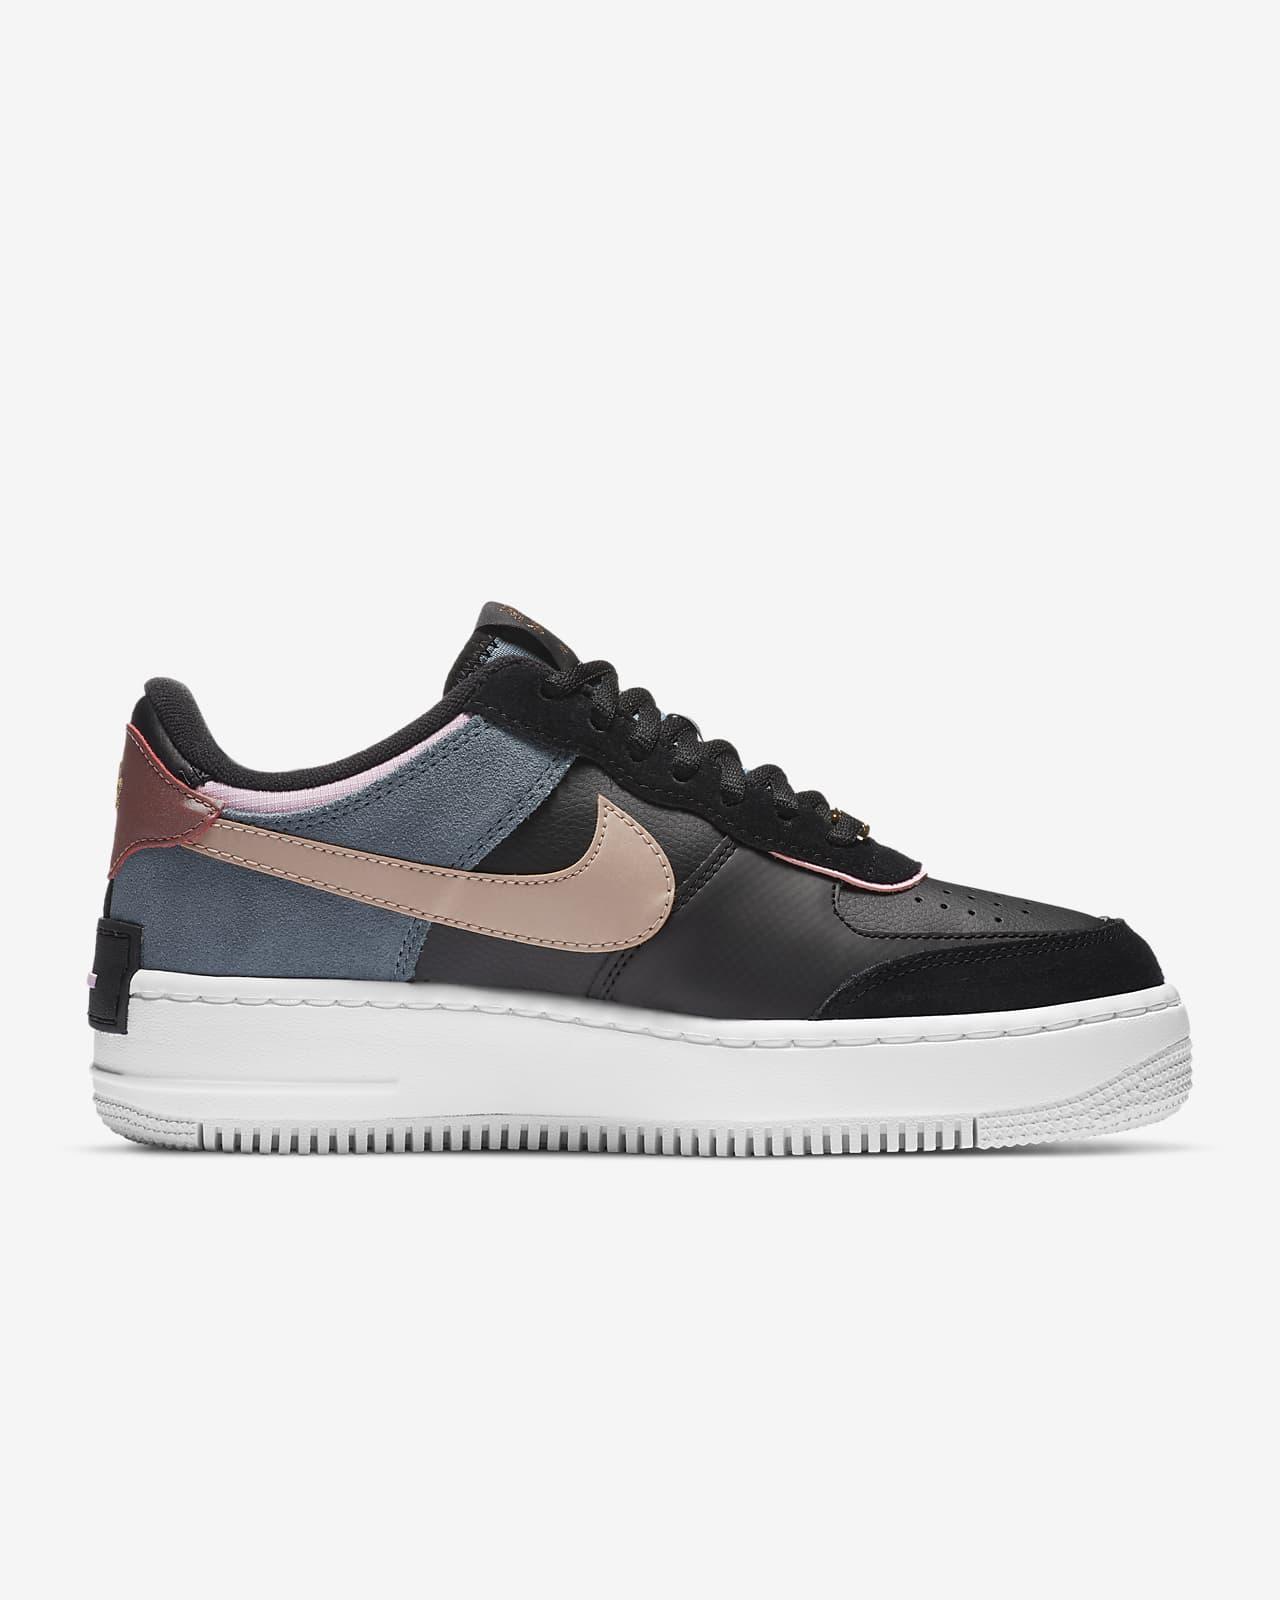 Nike Air Force 1 Shadow Women S Shoe Nike Id Nike air force 1 shadow black light arctic pink claystone red. nike air force 1 shadow women s shoe